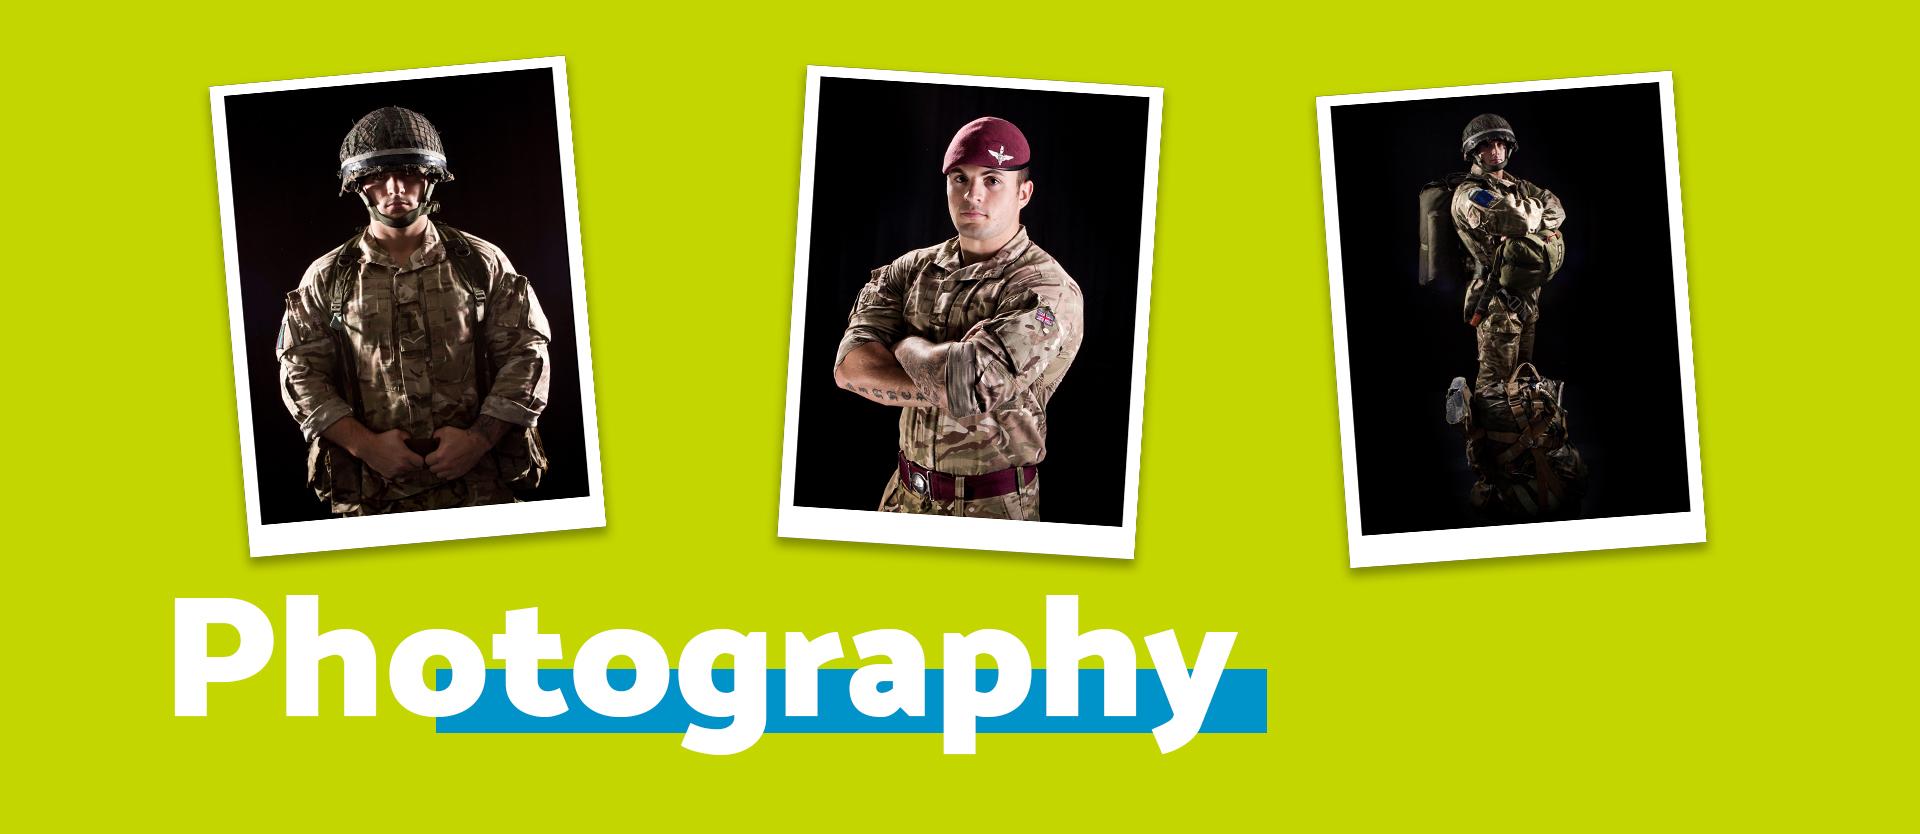 Photography Slide